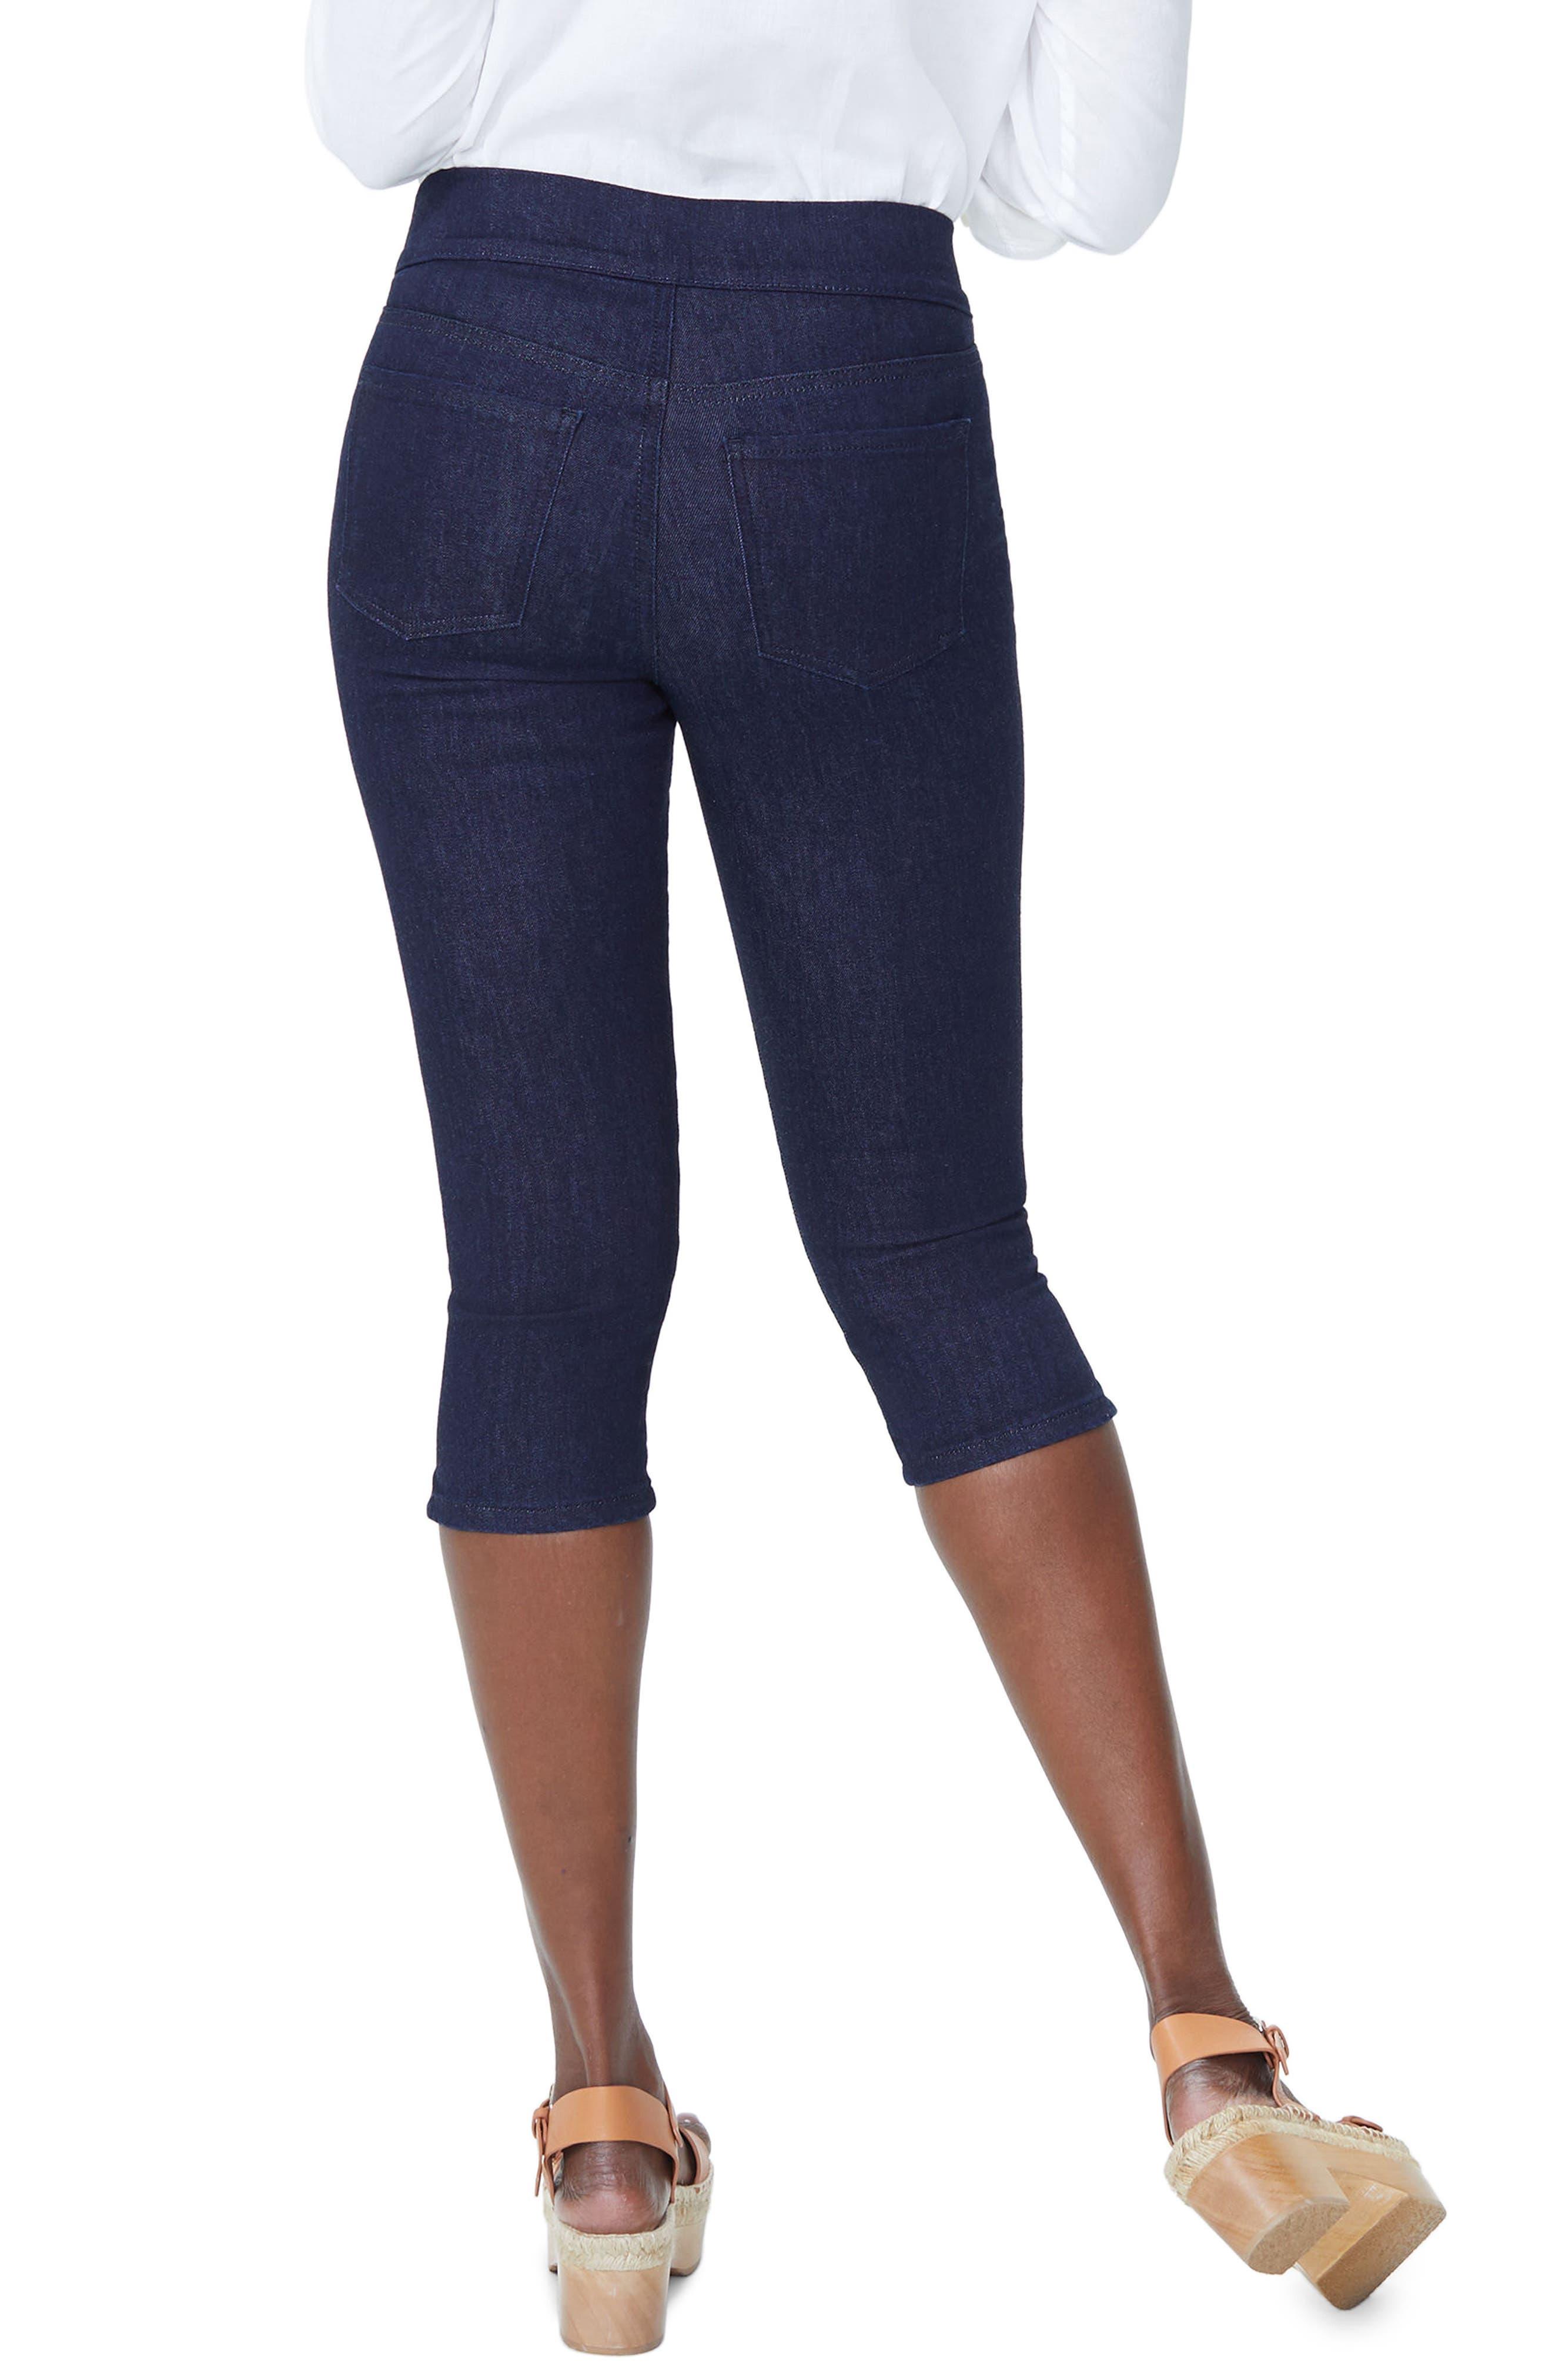 High Waist Pull-On Stretch Skinny Capri Jeans,                             Alternate thumbnail 2, color,                             408